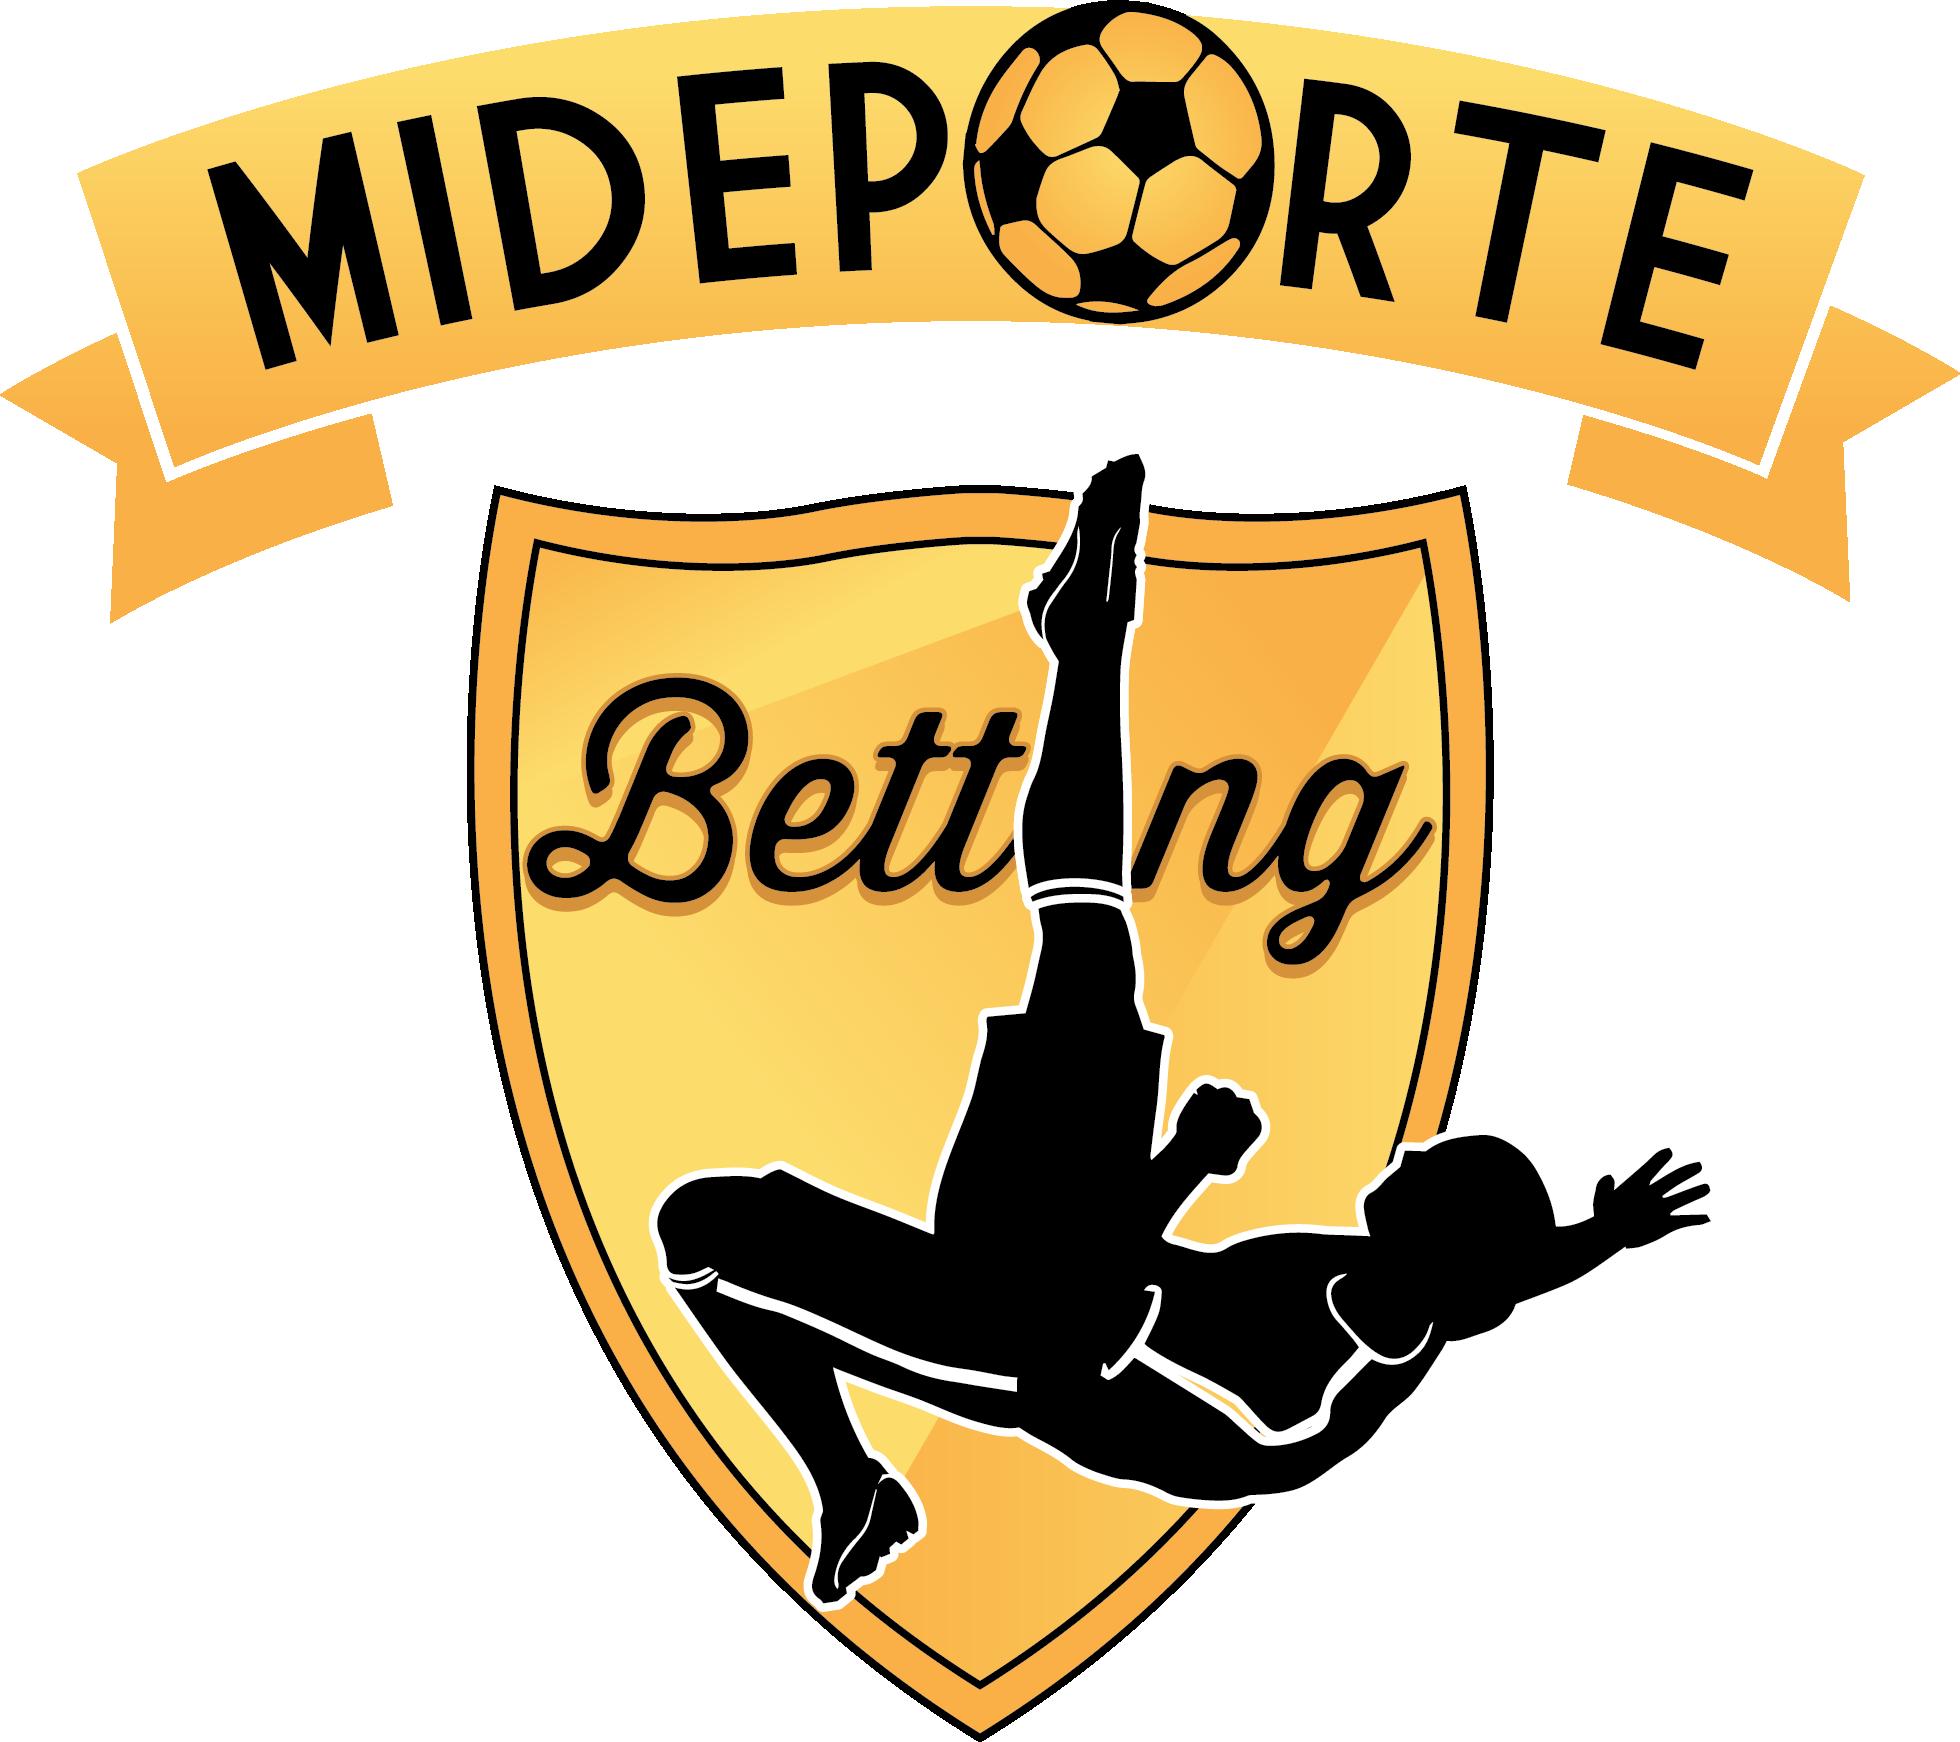 Mideporte logo